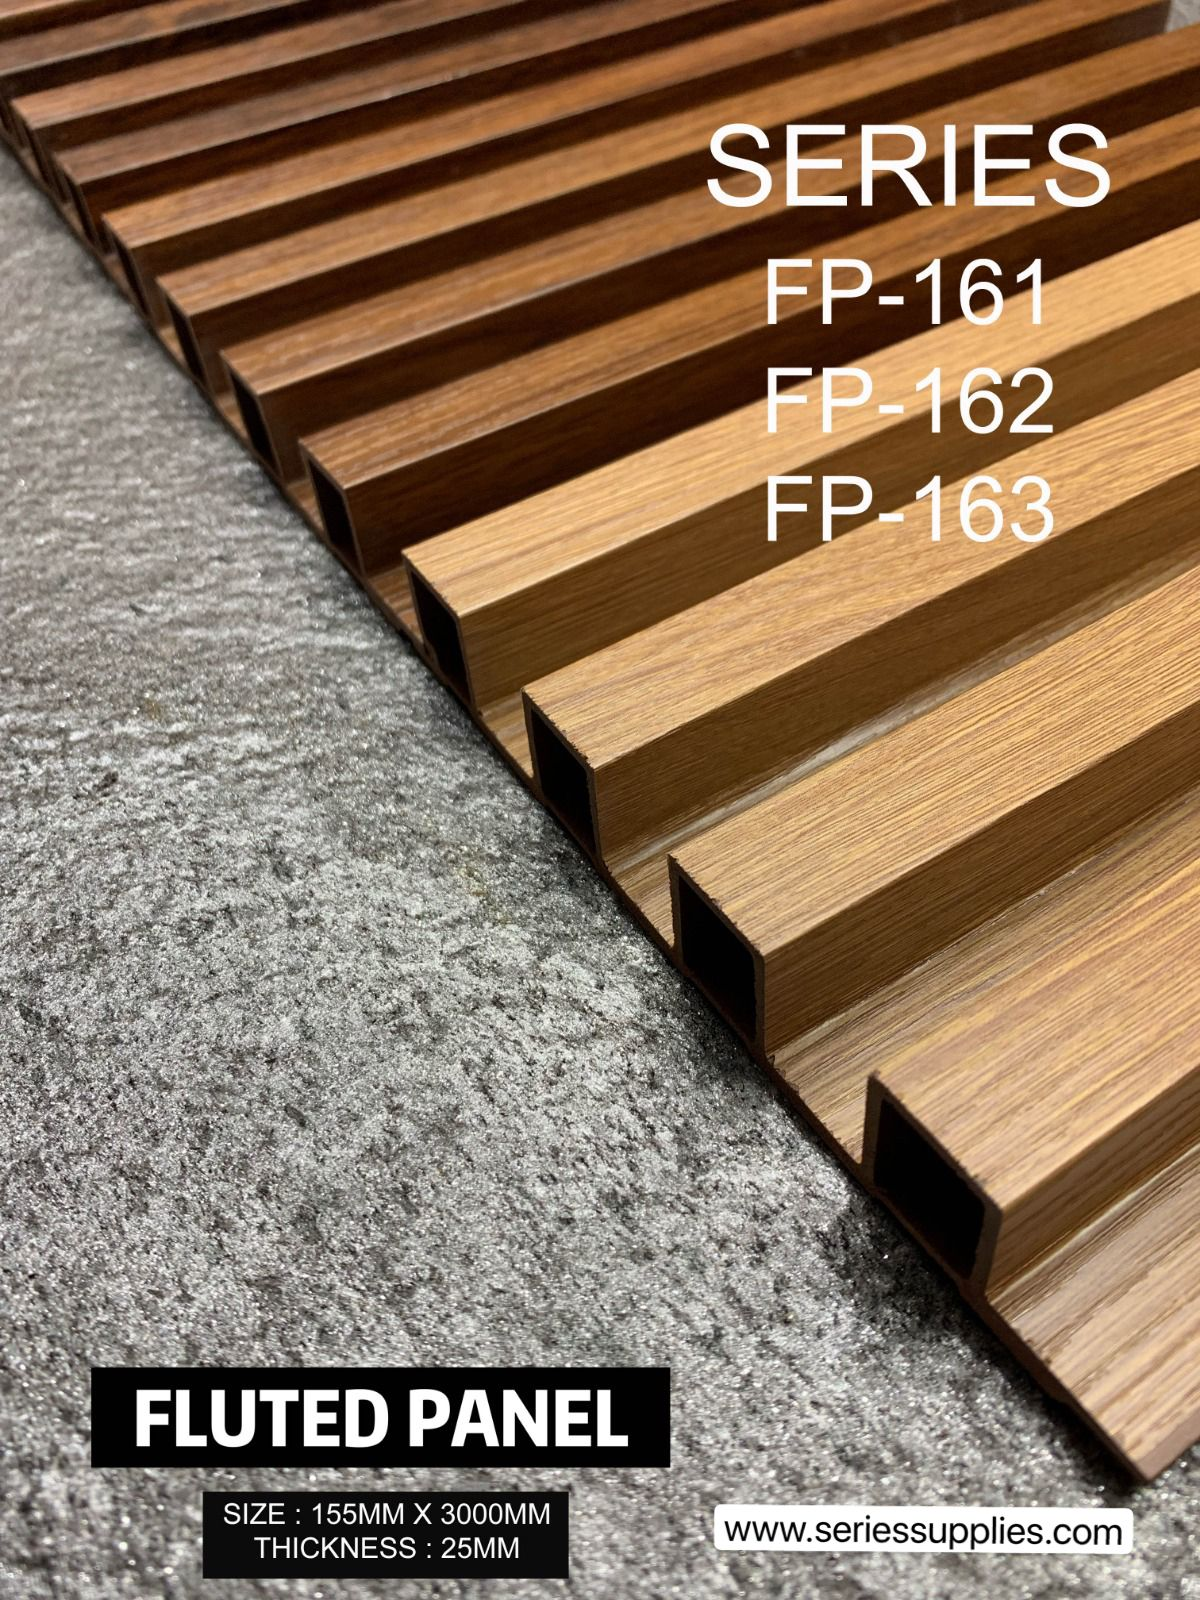 Wood Slats Wall Panel Wood Slat Wall Wooden Wall Design Slat Wall